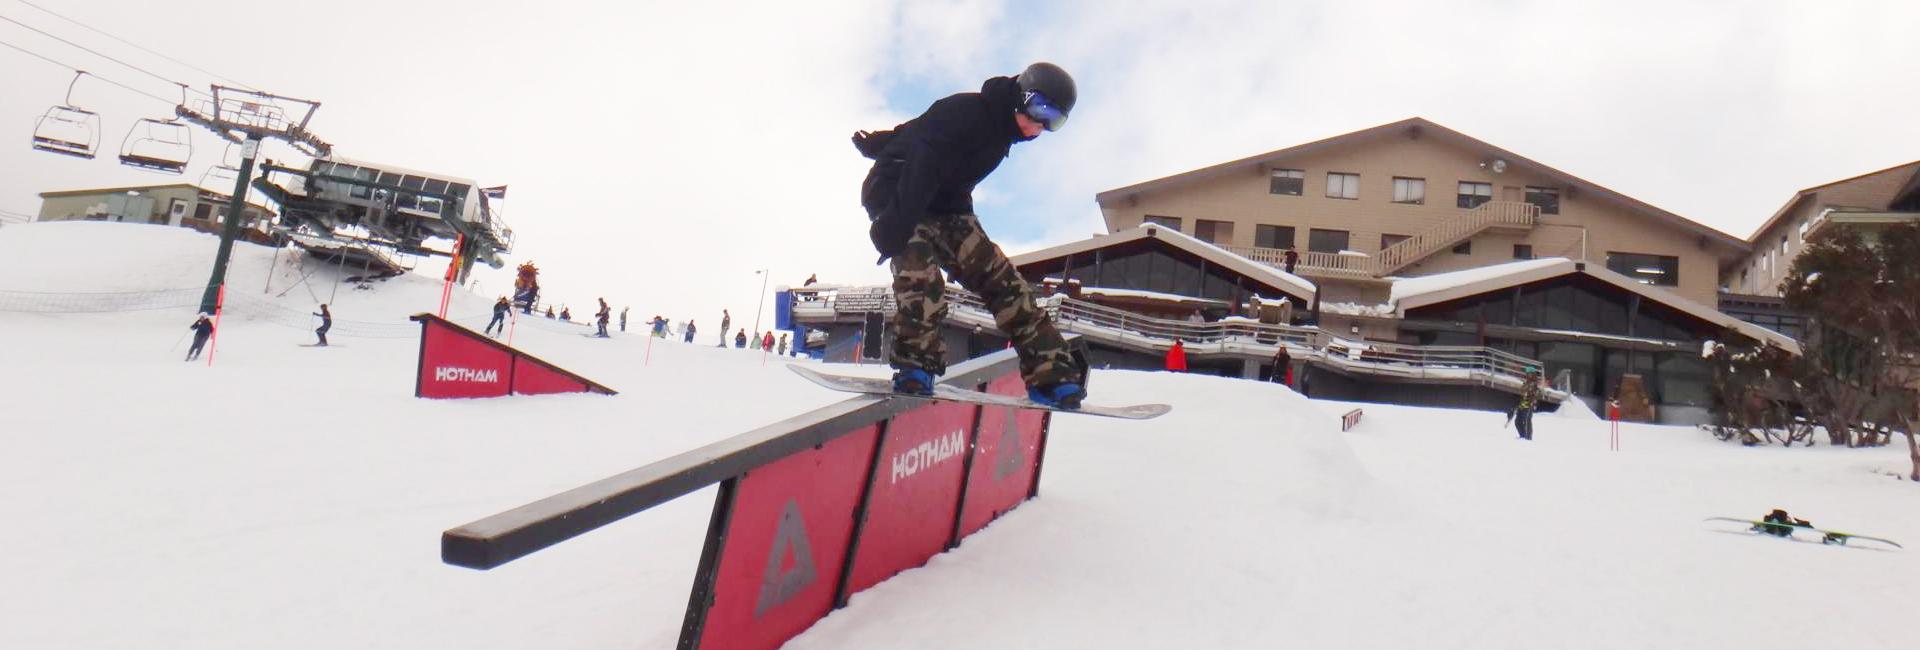 snowboarding a rail mt hotham